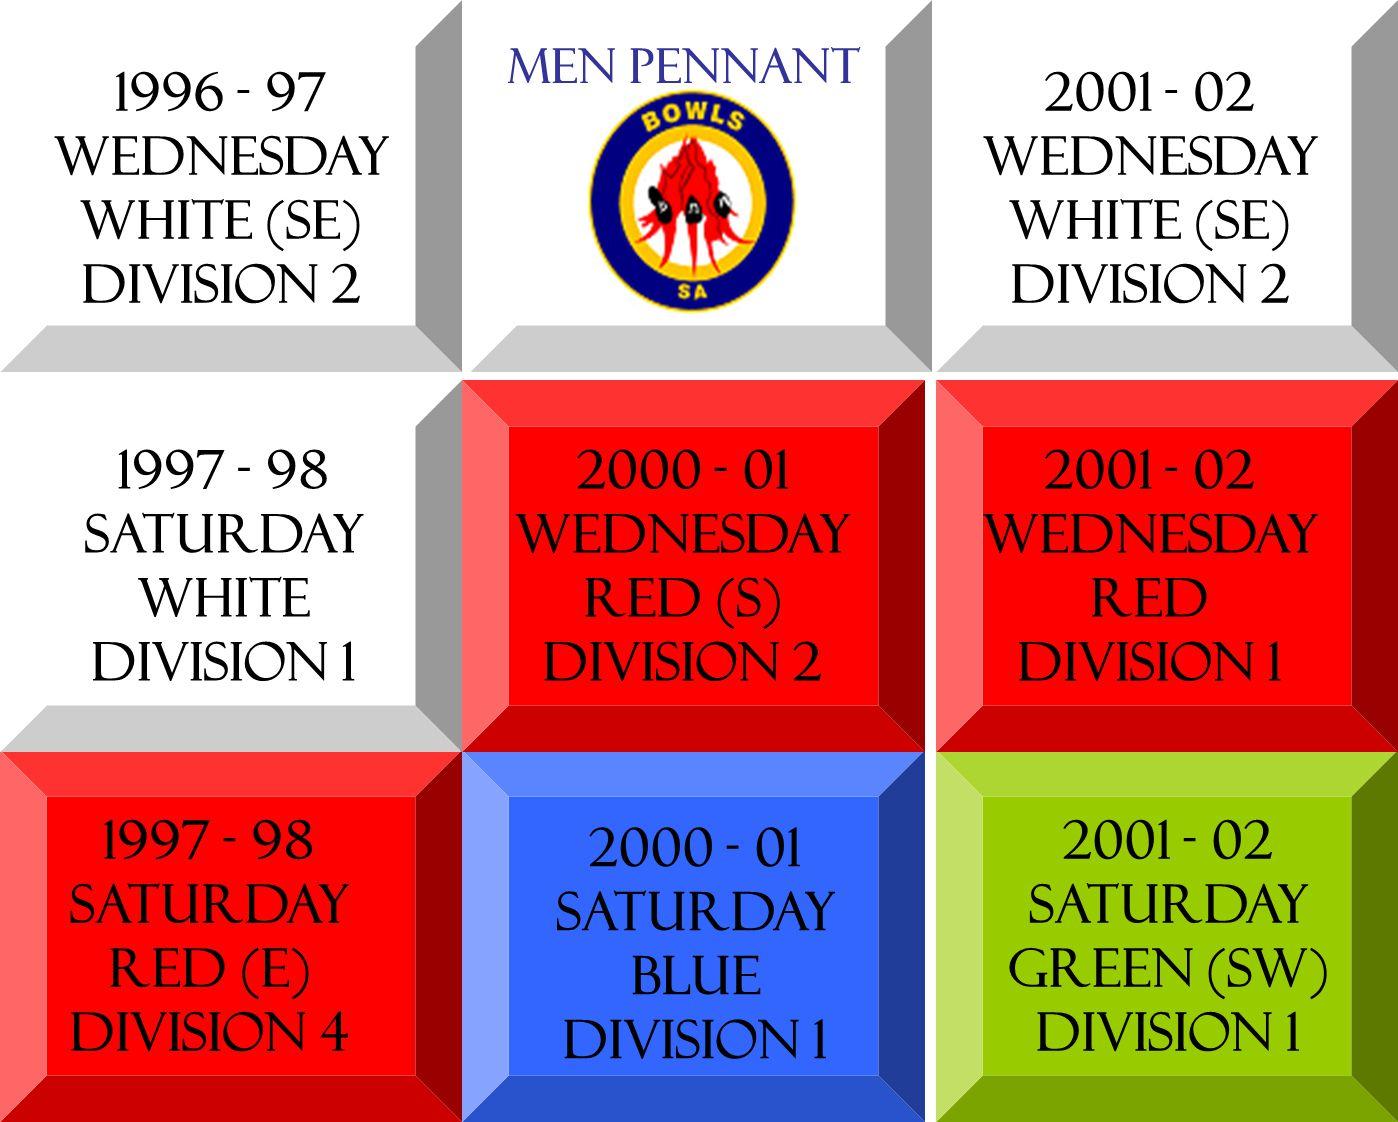 1996 - 97 WEDNESDAY white (se) DIVISION 2 1997 - 98 SATURDAY white DIVISION 1 1997 - 98 SATURDAY RED (E) DIVISION 4 2000 - 01 WEDNESDAY RED (S) DIVISI